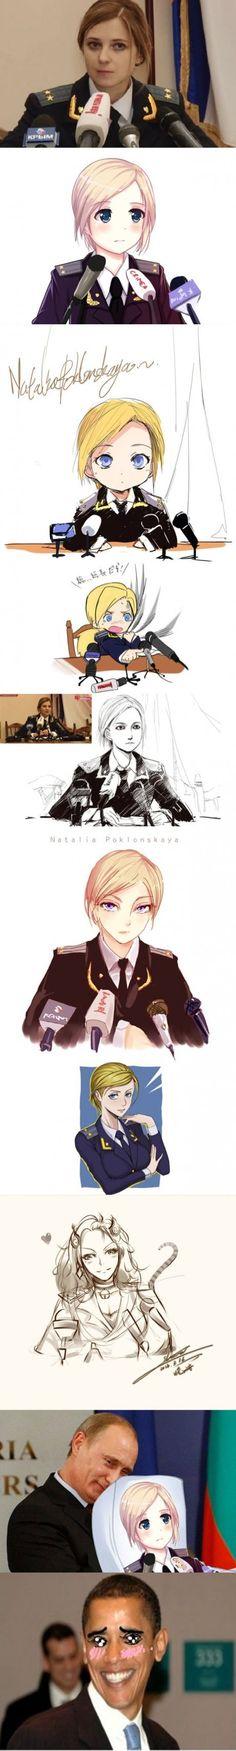 Natalia Poklonskaya, japan edition